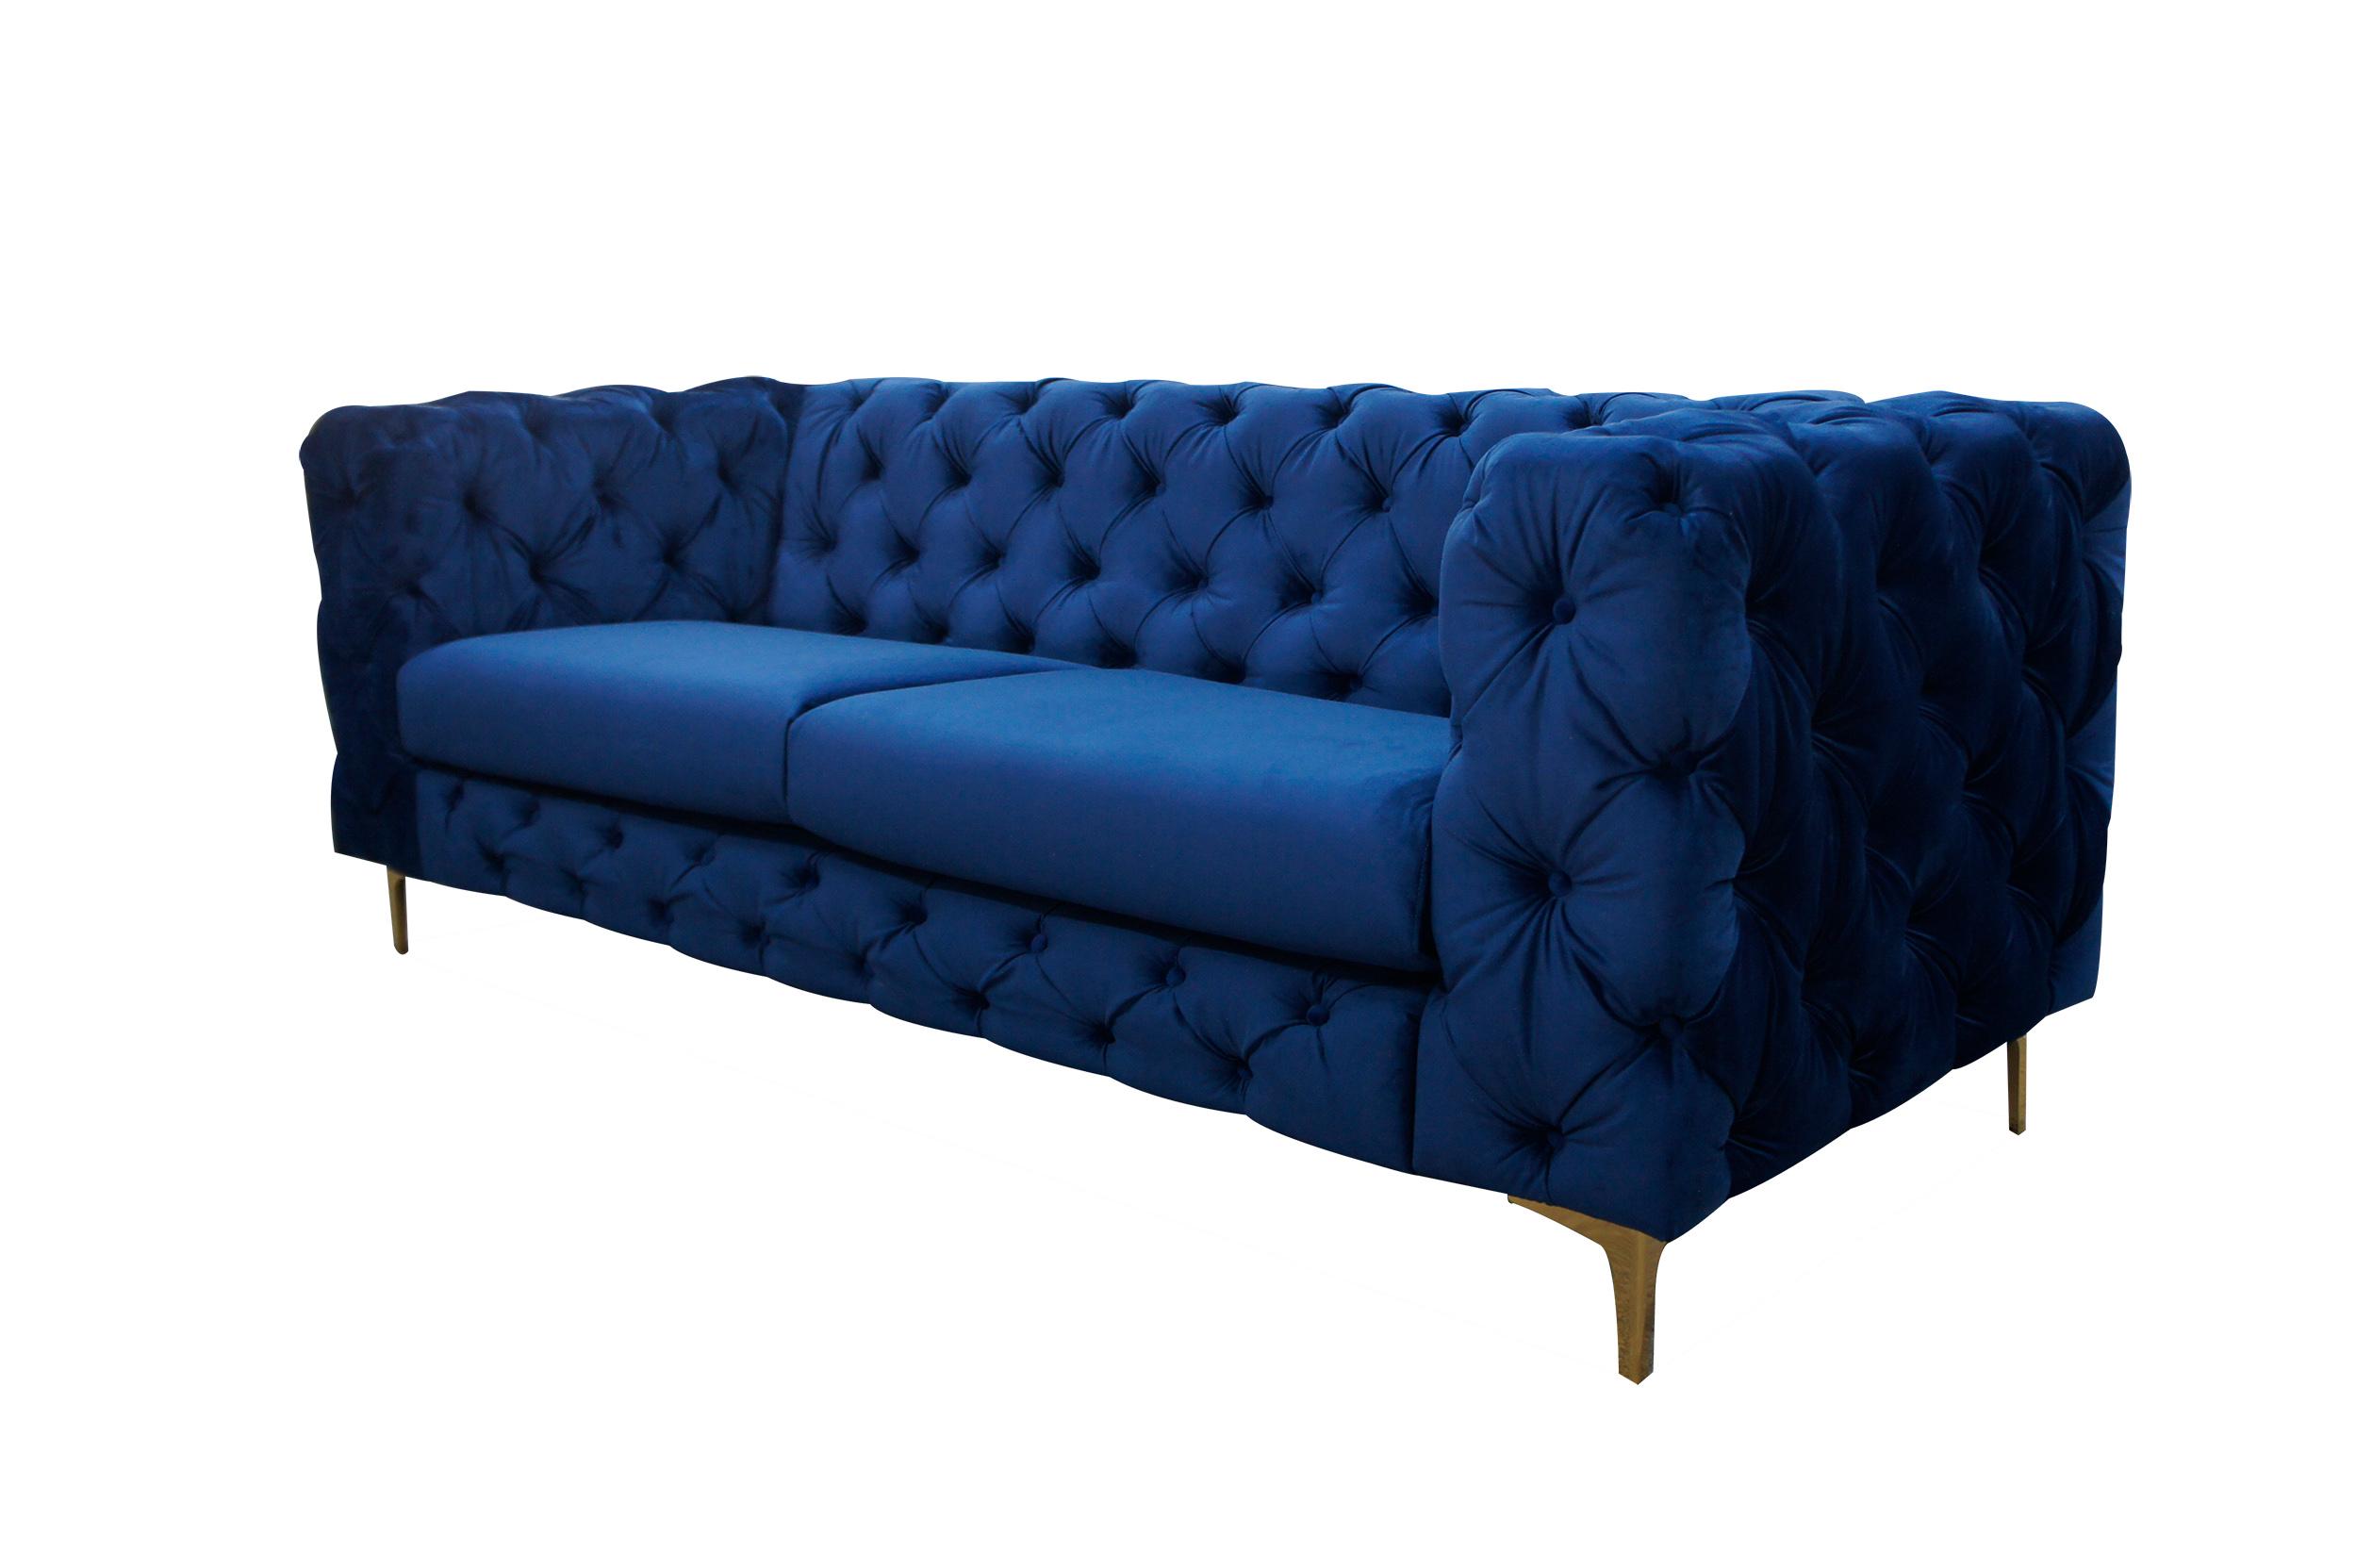 Full Size of Sofa Blau Lc Home 3er Dreisitzer Couch Kingdom Chesterfield Samt Barock 2 Sitzer Mit Relaxfunktion Innovation Berlin Englisches Cassina Big Grau Terassen Sofa Sofa Blau